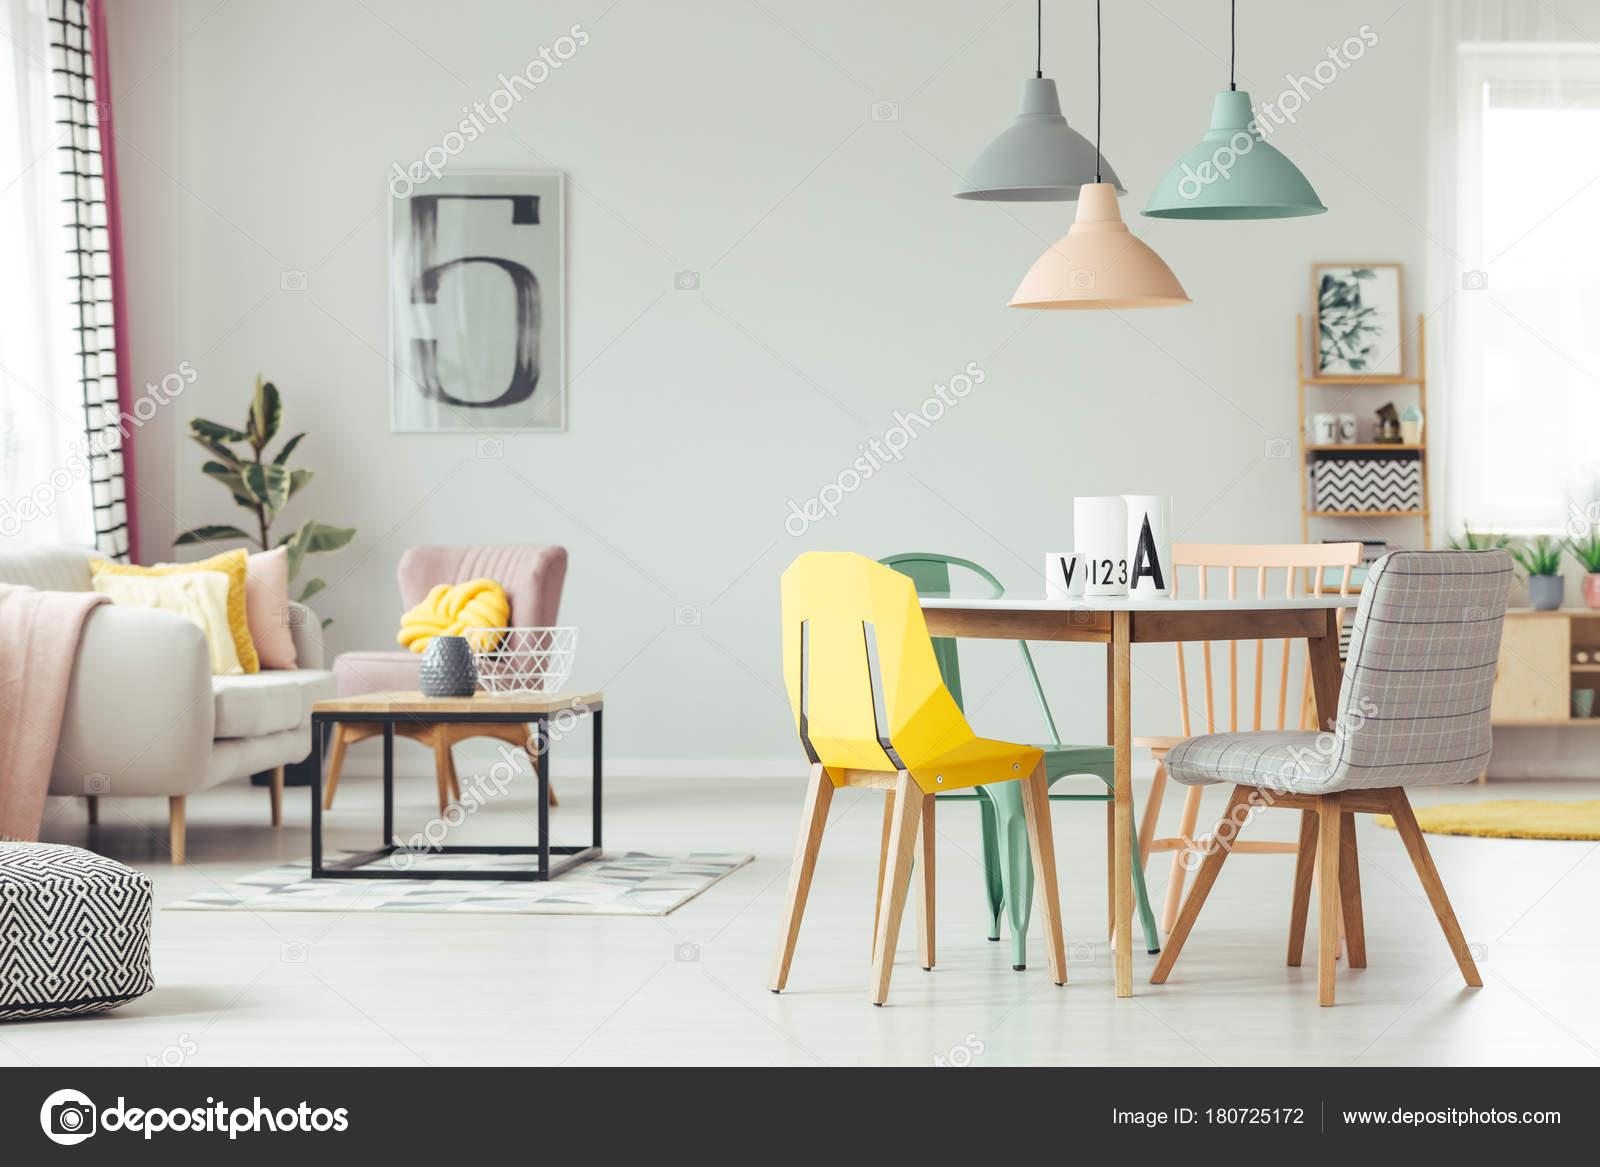 Kleurrijke Interieurs Pastel : Kleurrijke woonkamer interieur u2014 stockfoto © photographee.eu #180725172